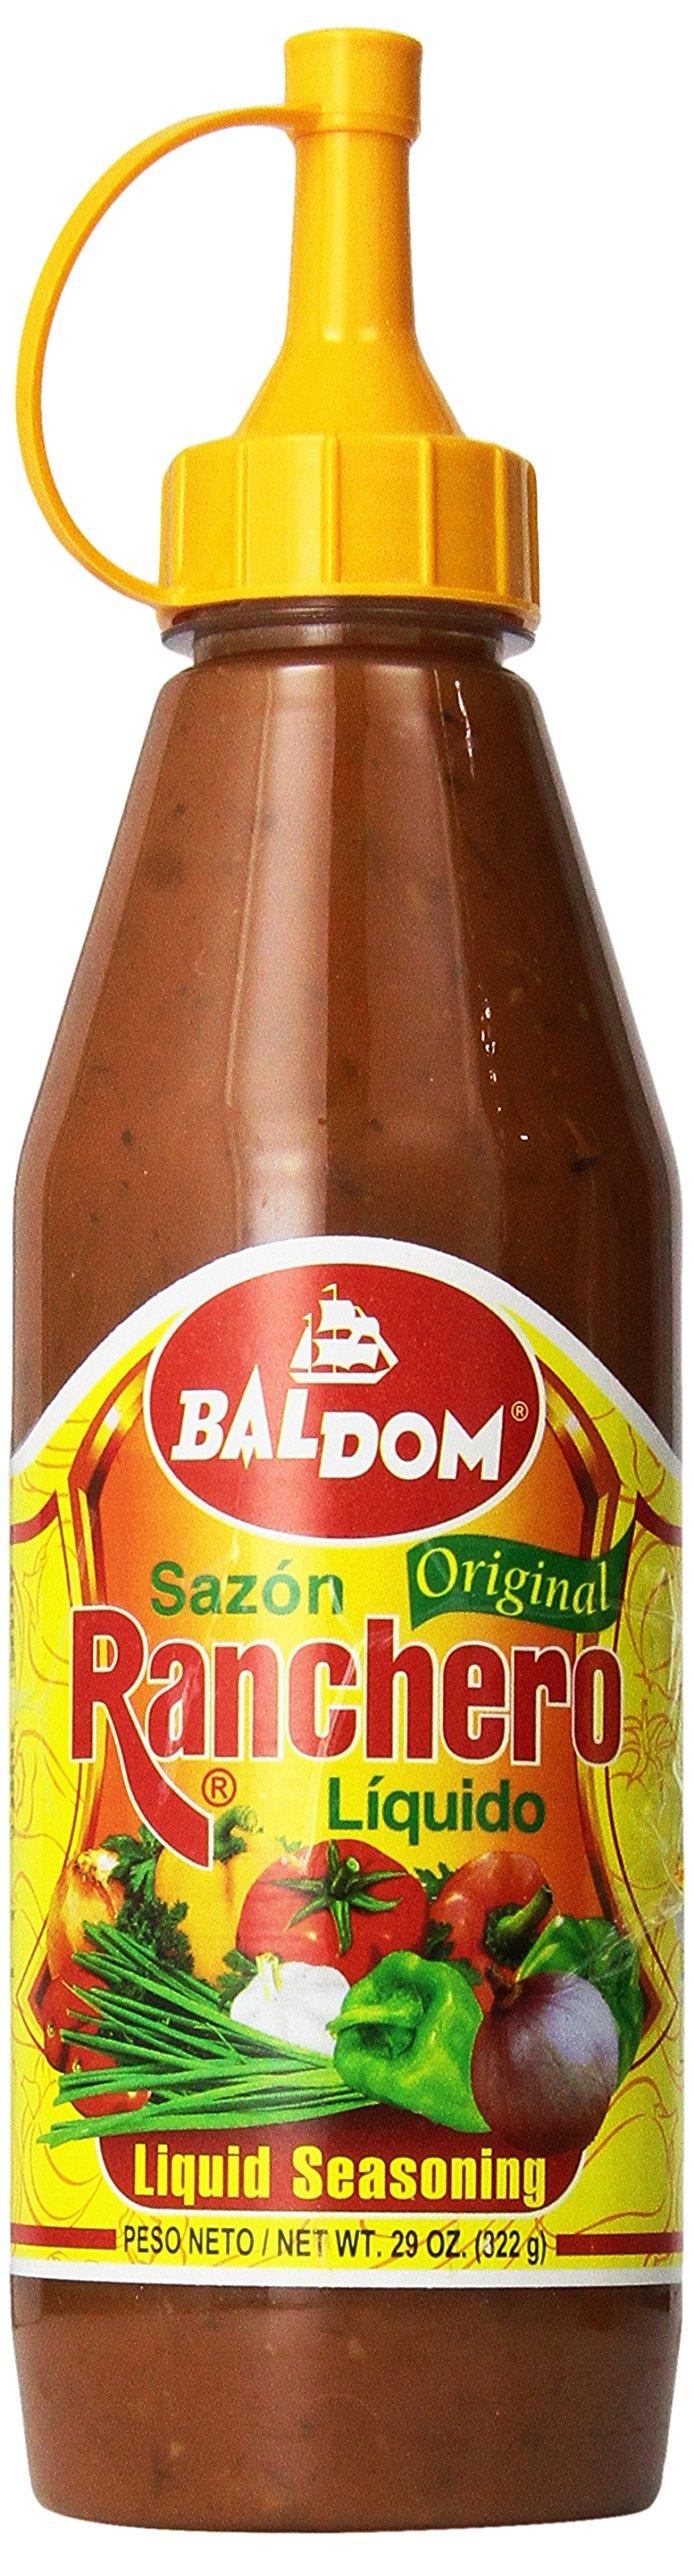 Baldom Sazon Ranchero Liquido Original 29 Oz (Pack of 2)